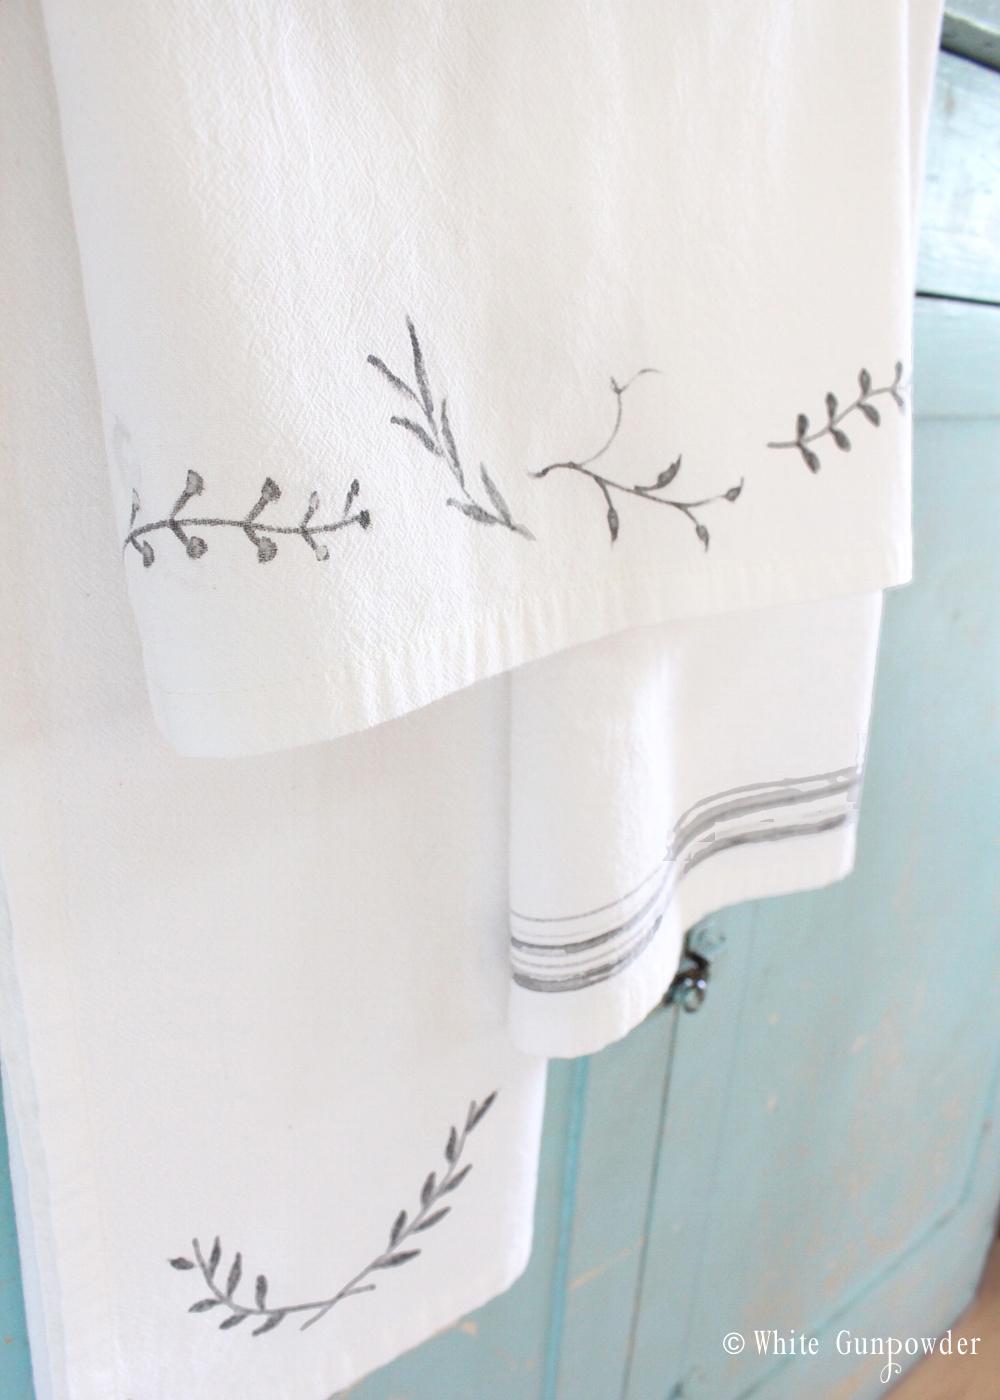 diy Flour Sack Towels and Fabric Markers - White Gunpowder